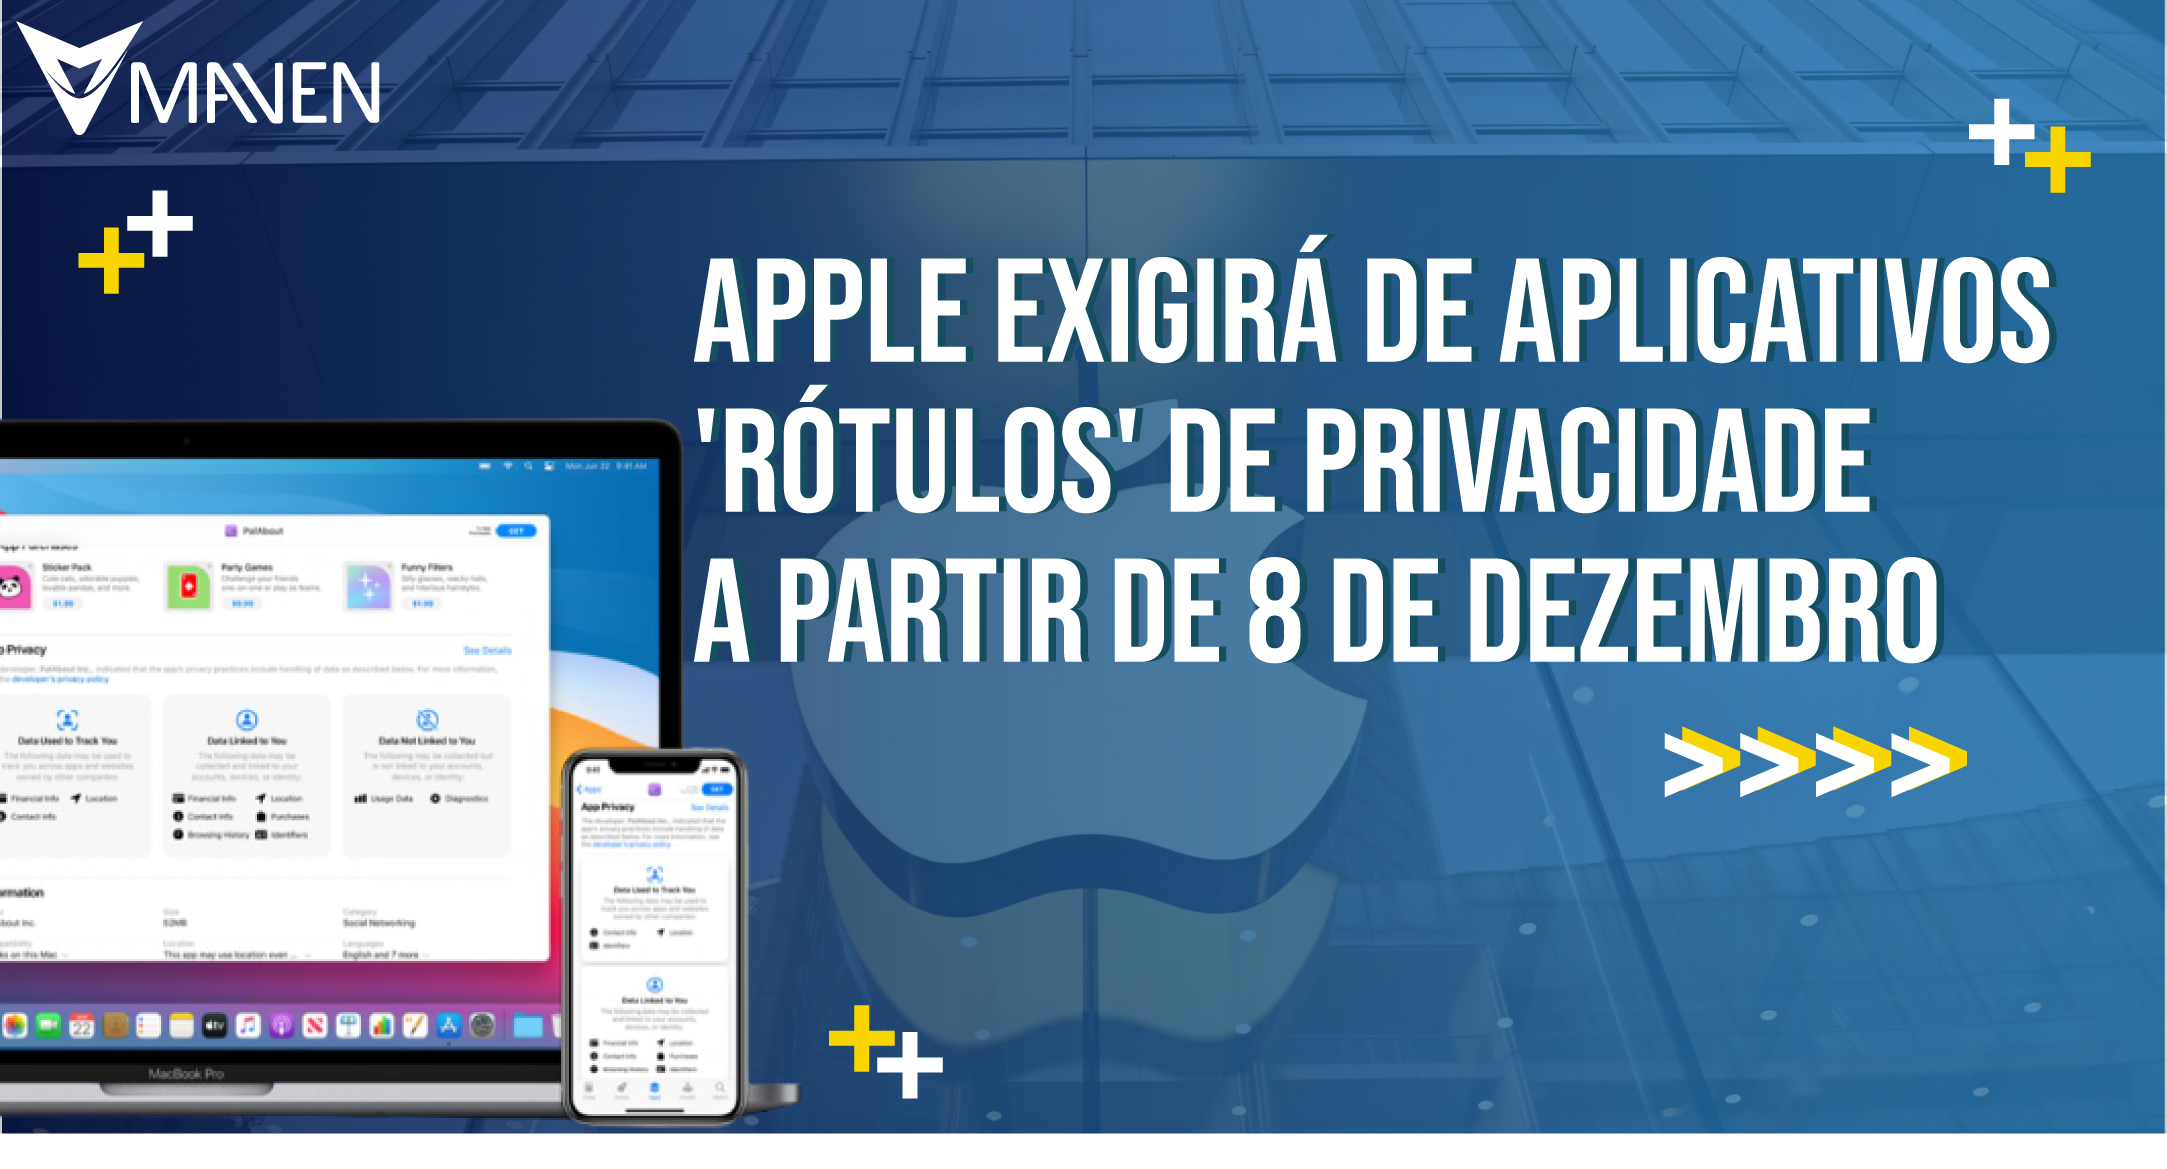 Apple exigirá de aplicativos 'rótulos' de privacidade a partir de 8 de dezembro